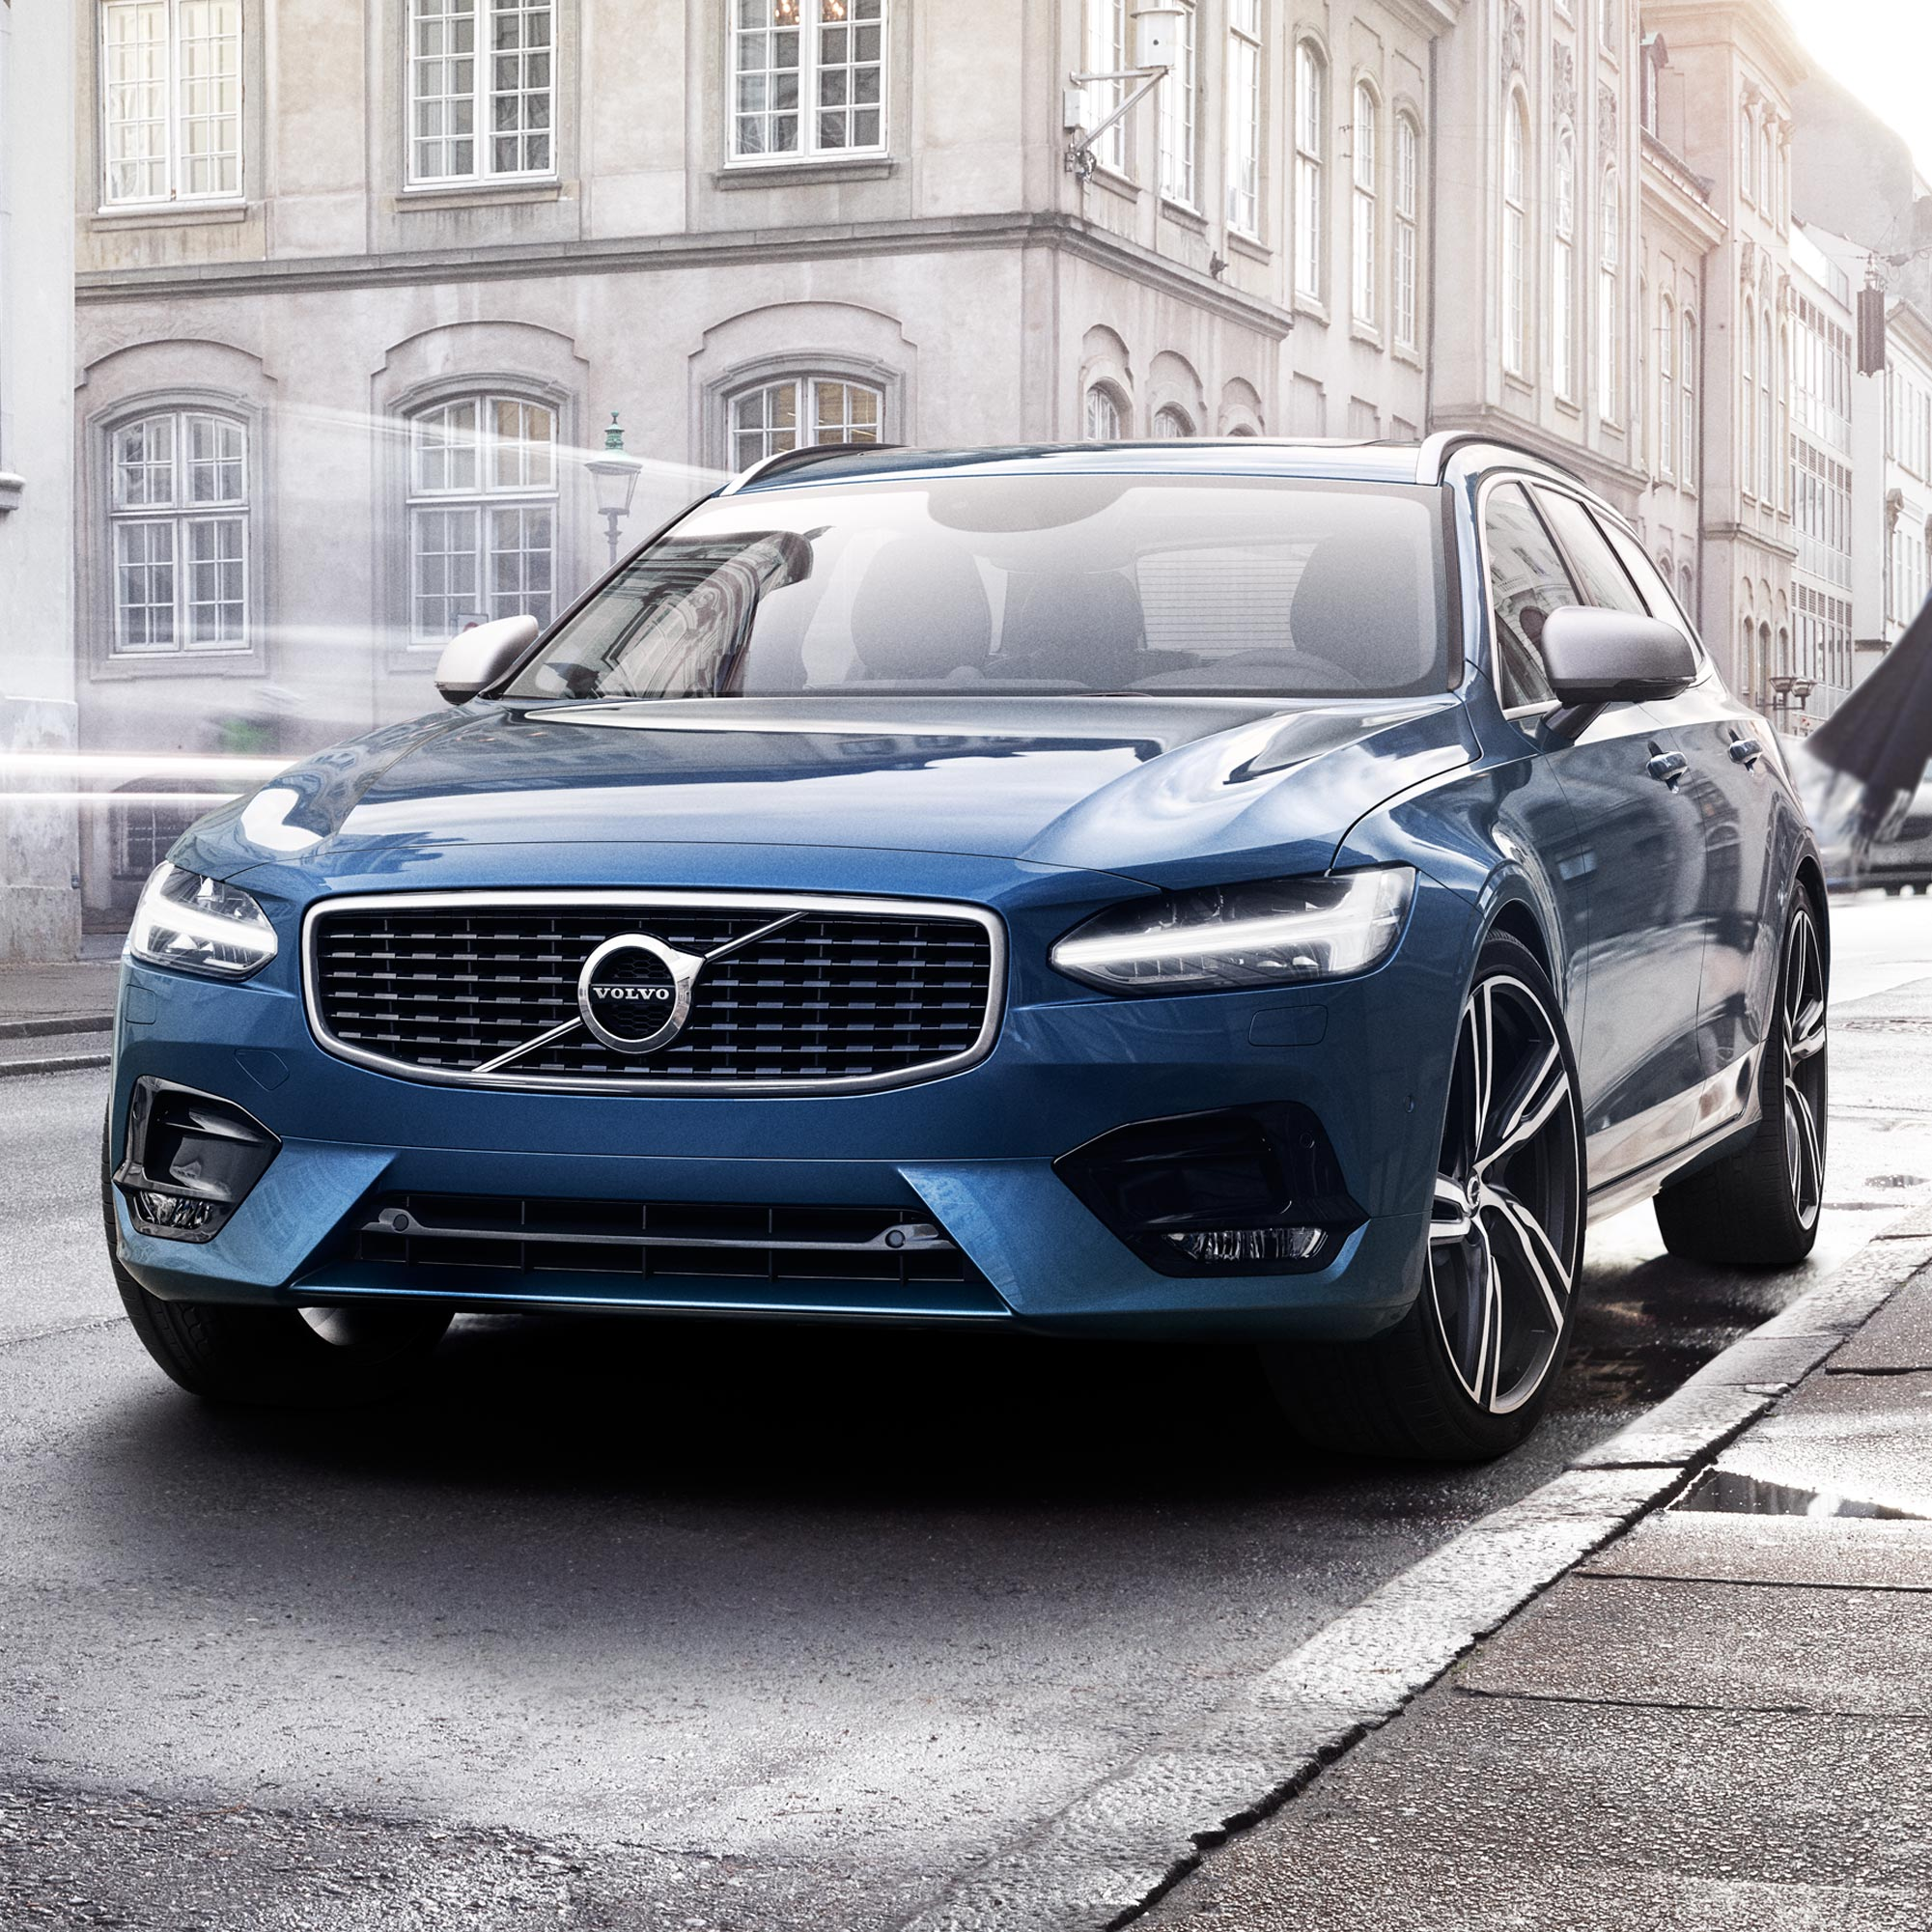 Volvo Overseas Delivery